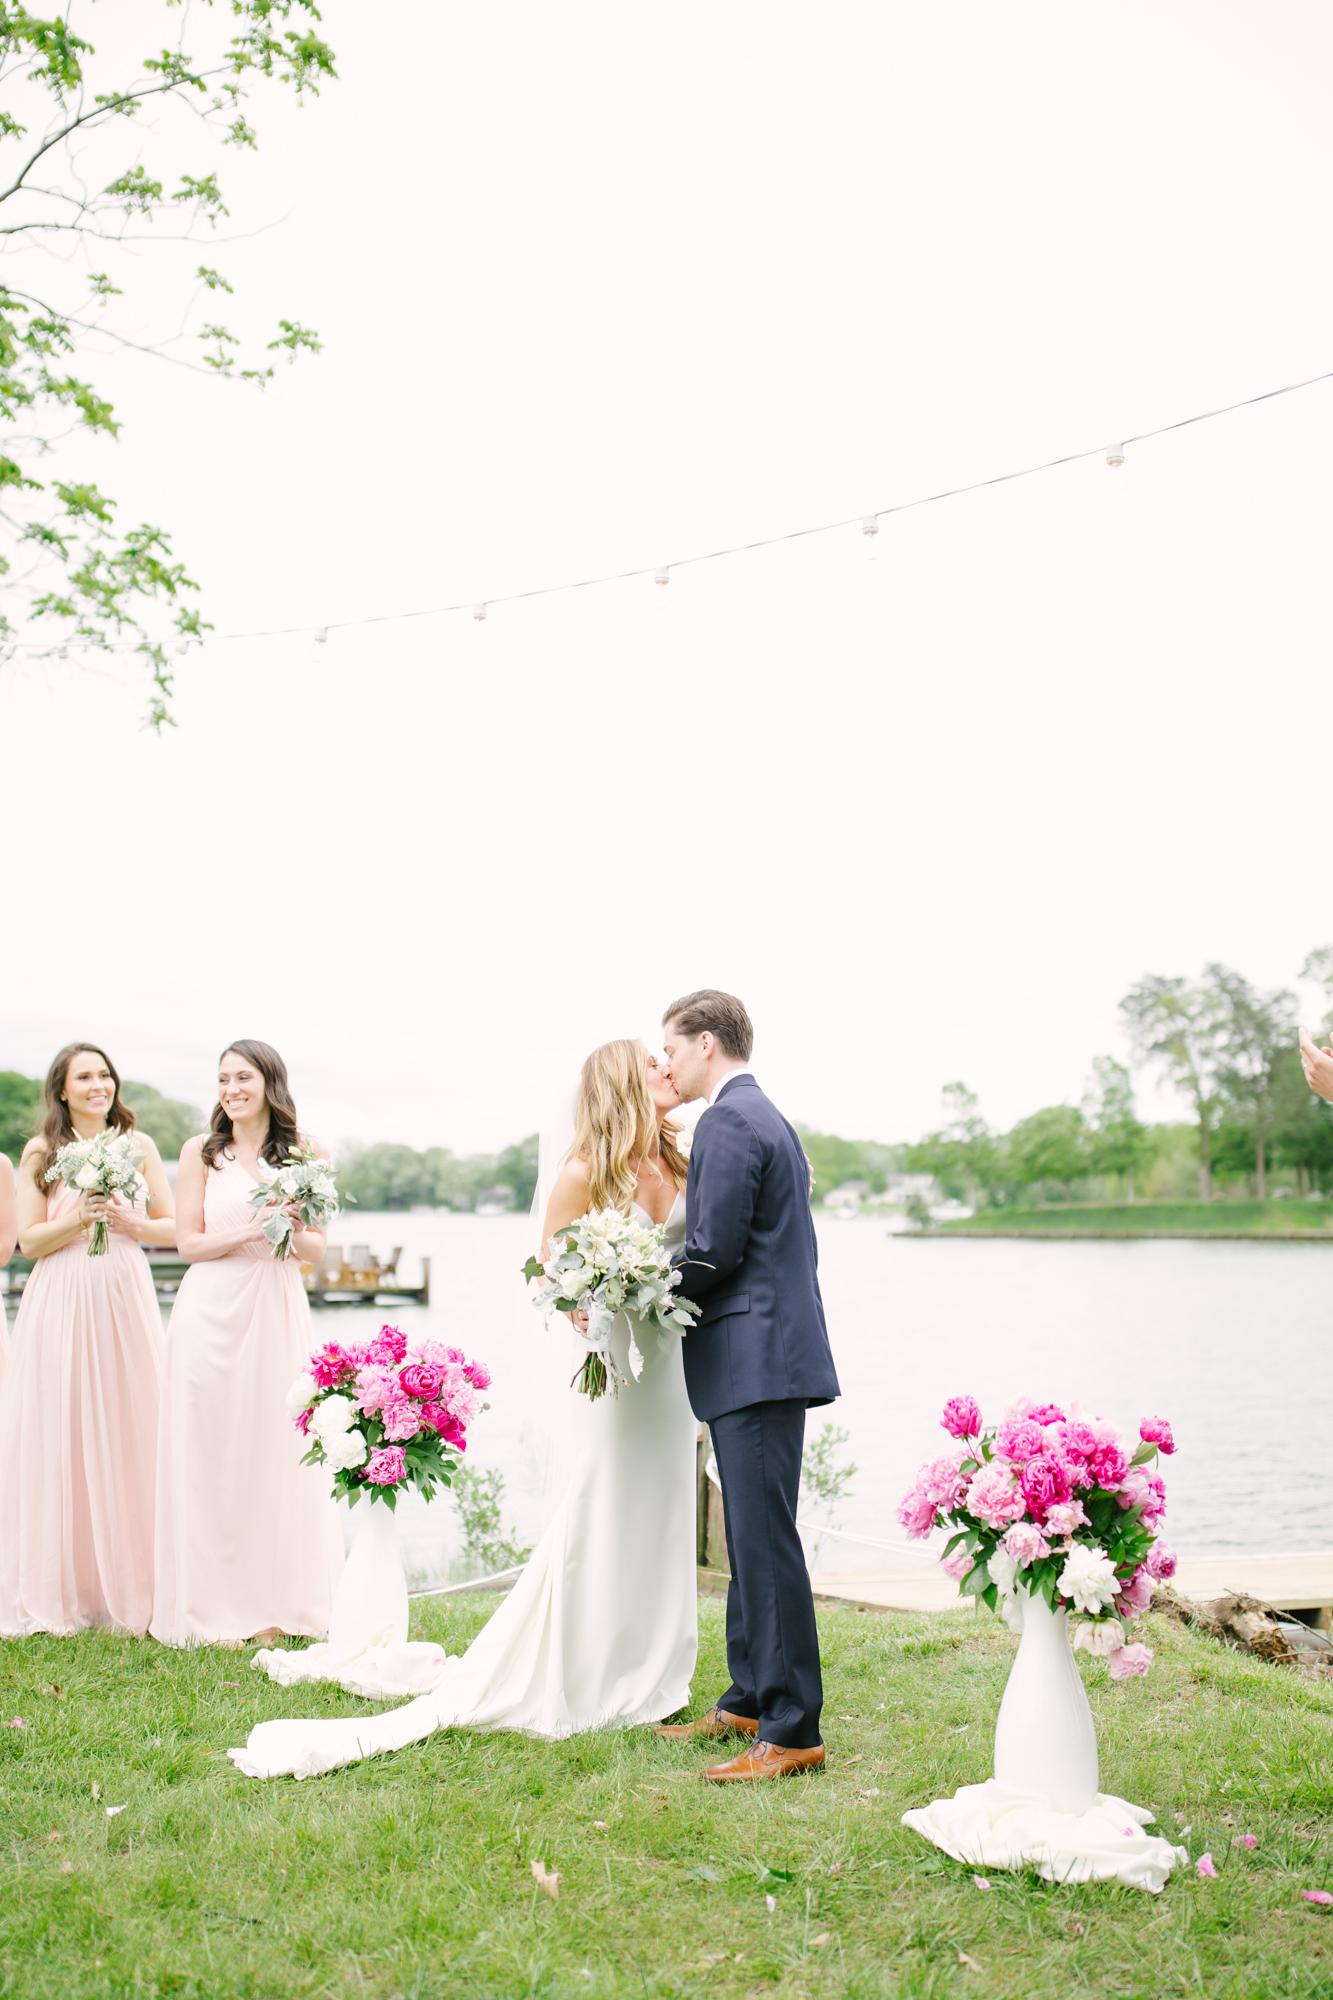 Maral Noori Photography | Easton Maryland Wedding | Pricing